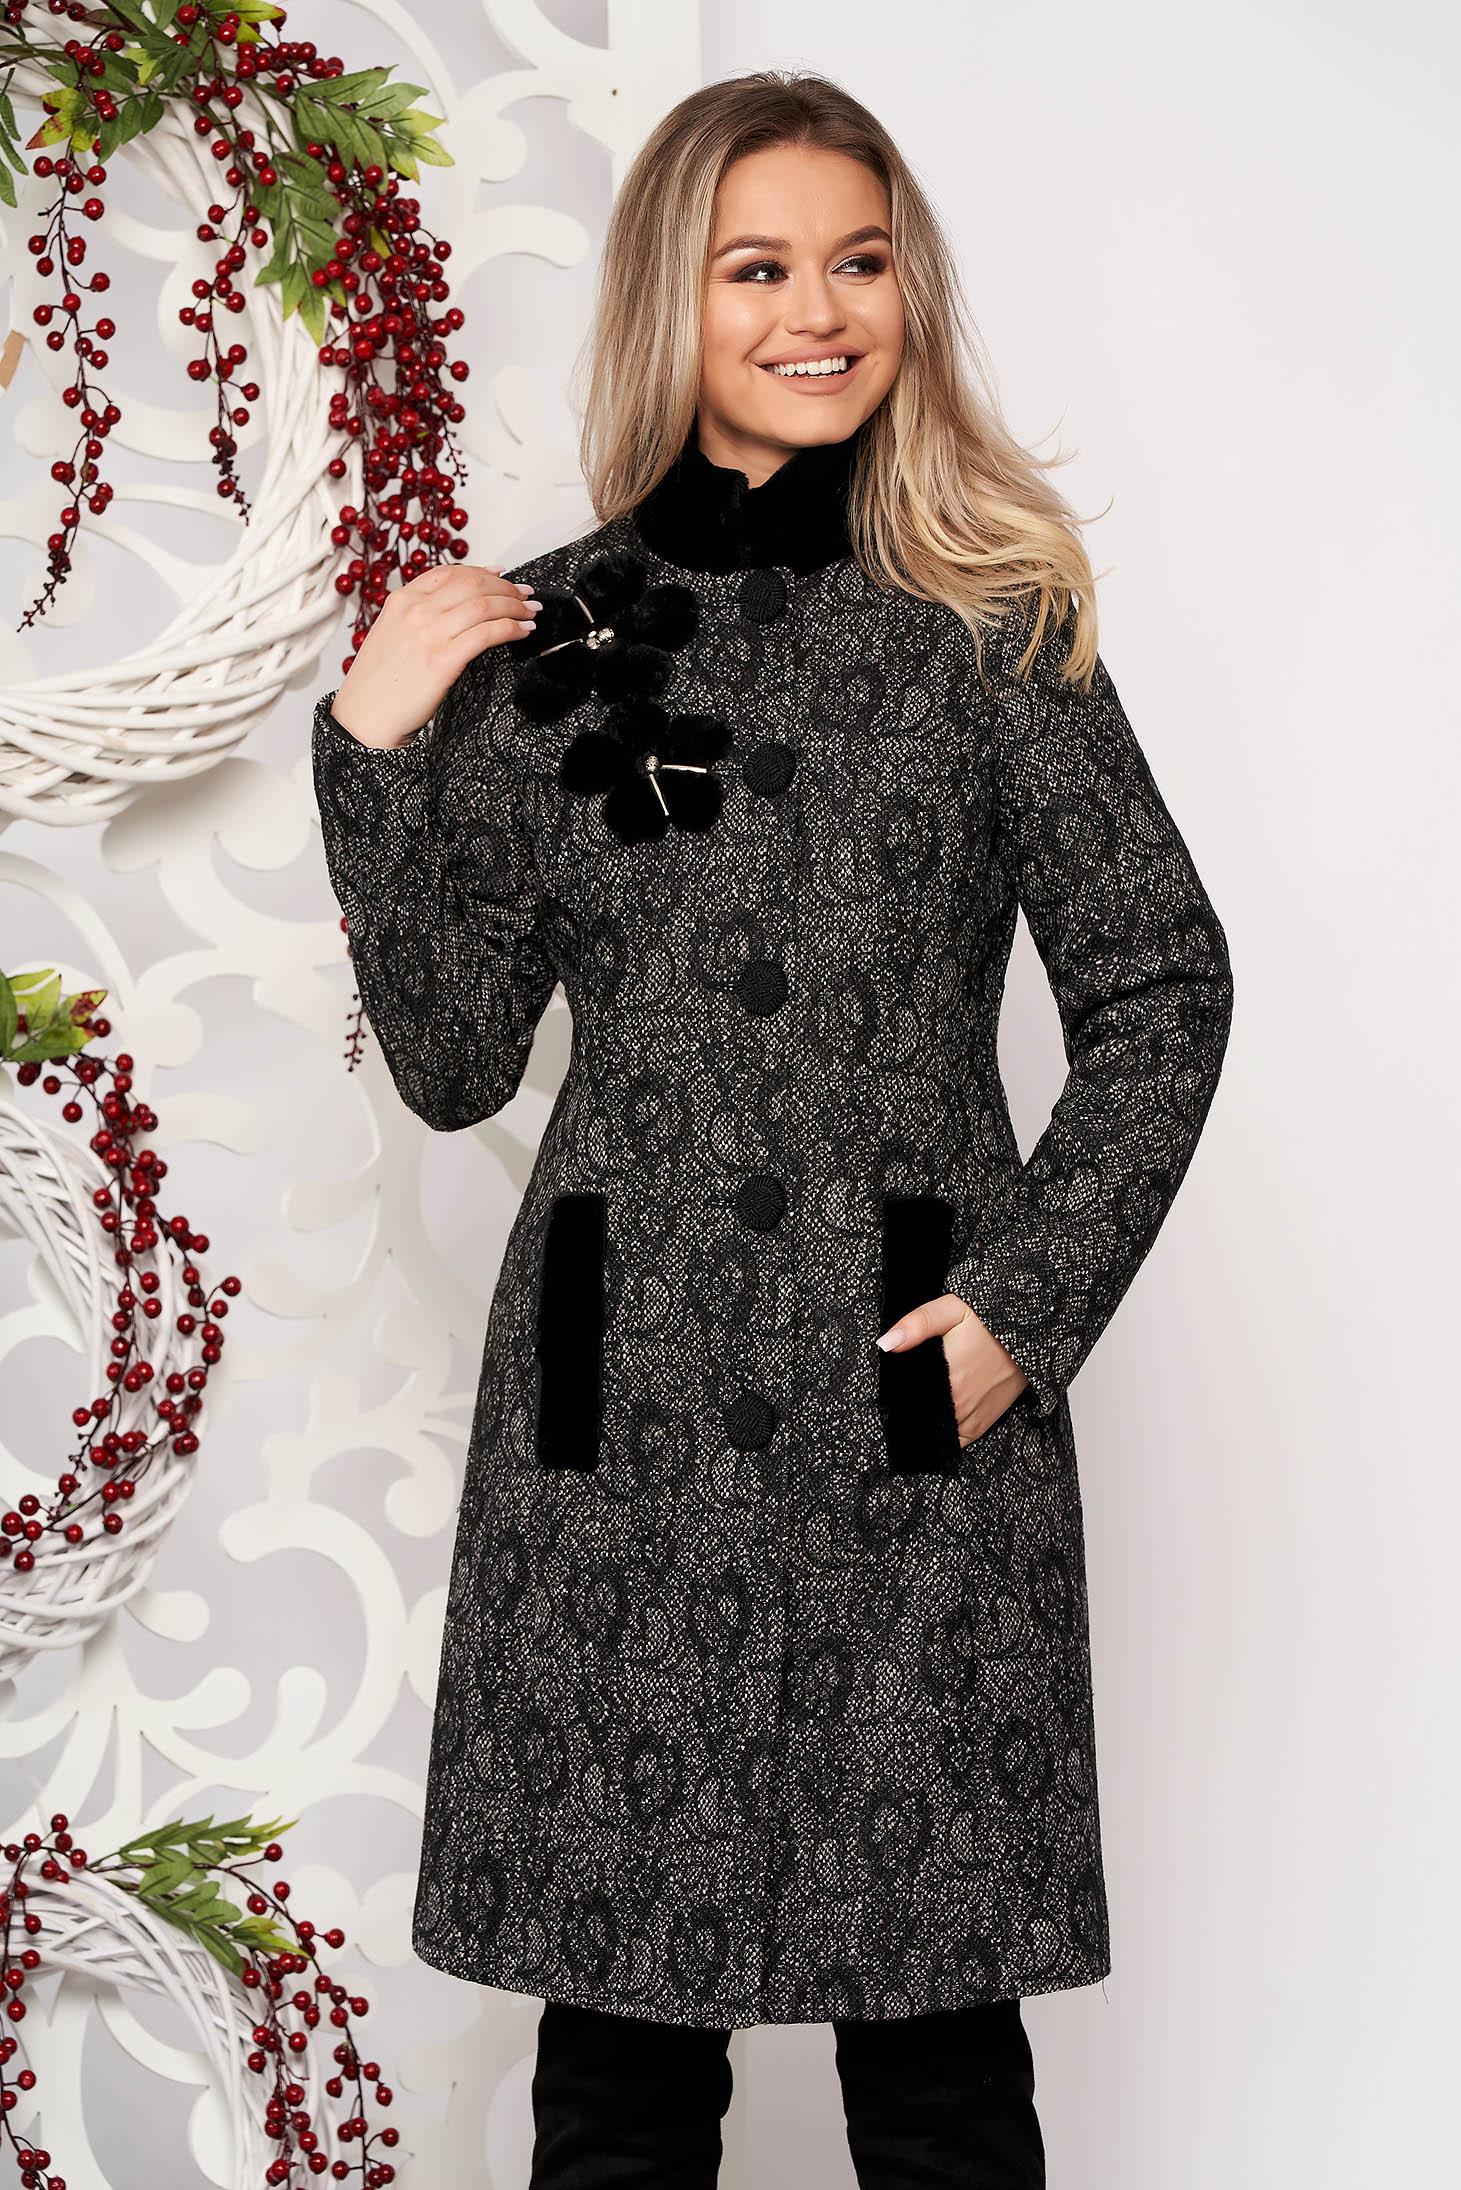 Palton LaDonna negru elegant cambrat cu detalii handmade din lana captusit pe interior